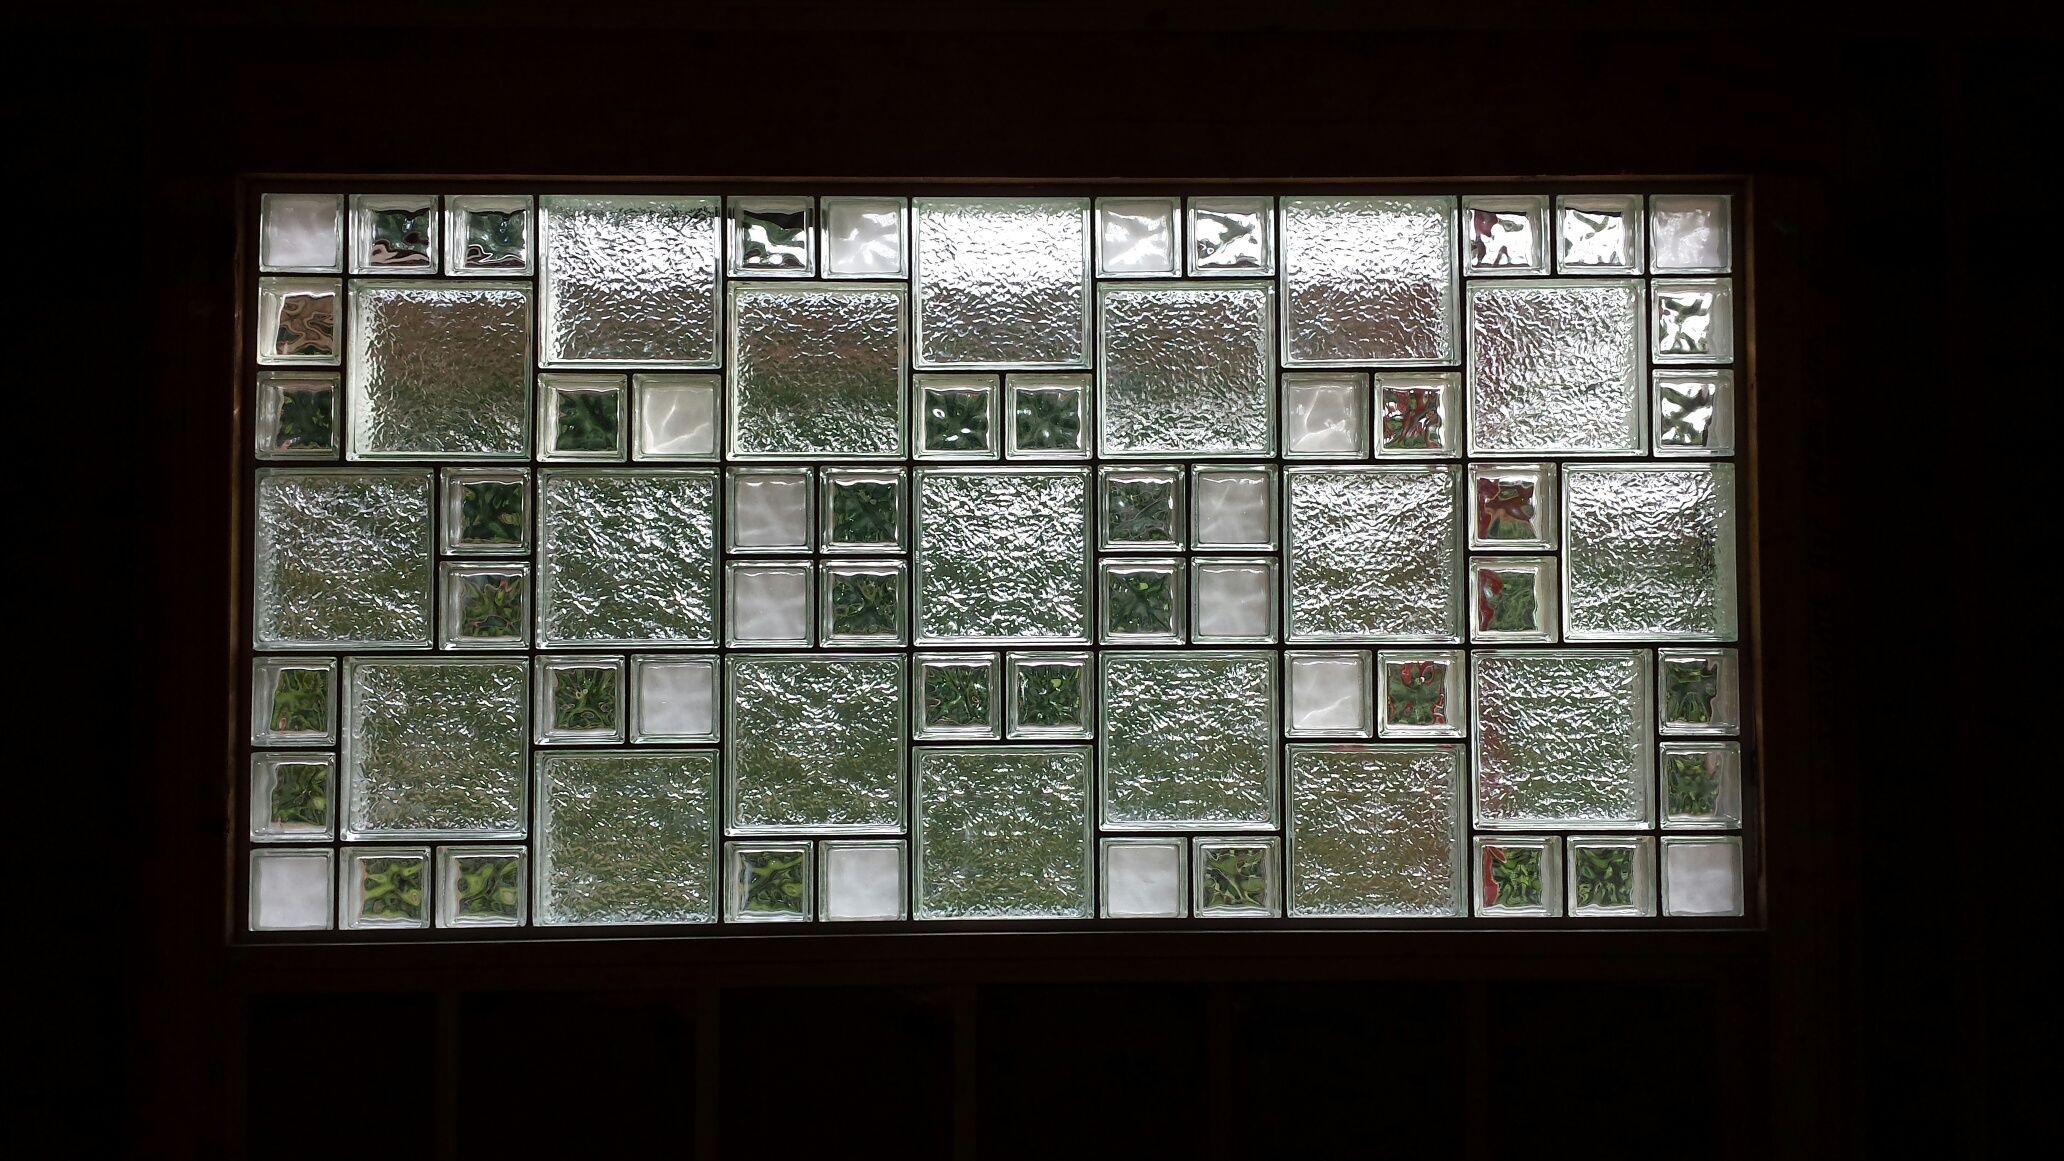 glass block window in shower wood framing beautiful glass block window using decora mist and decora lx blocks in different sizes